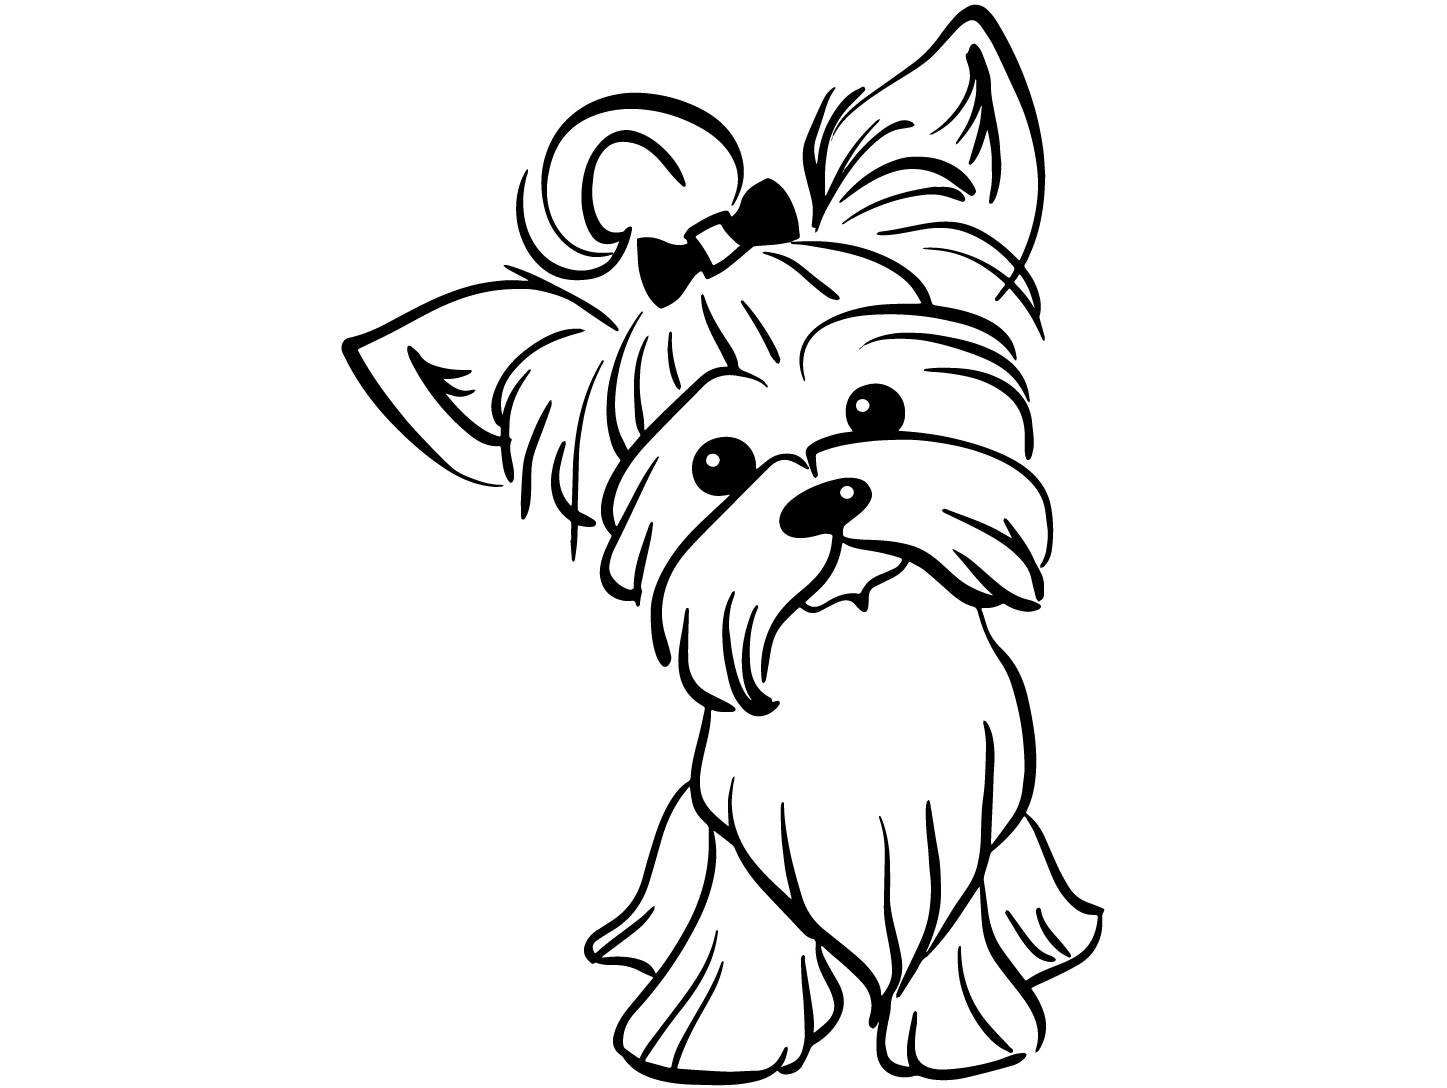 1447x1088 Yorkshire Terrier 3 Yorkie Dog Breed K 9 Pedigree Purebred